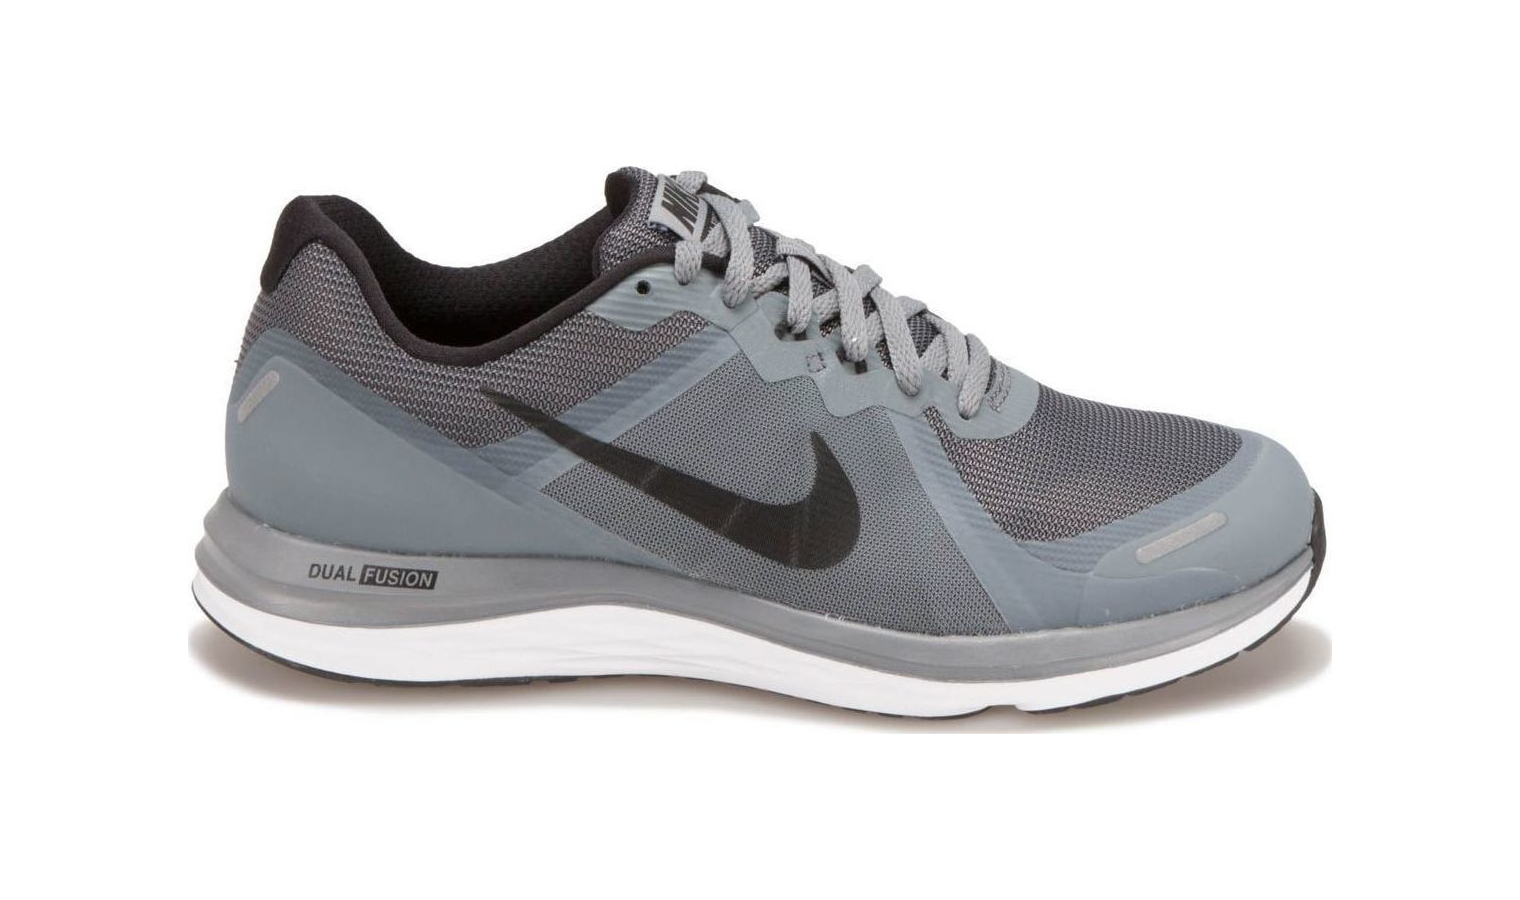 4d71c49dc1f Pánské běžecké boty Nike DUAL FUSION X 2 šedé